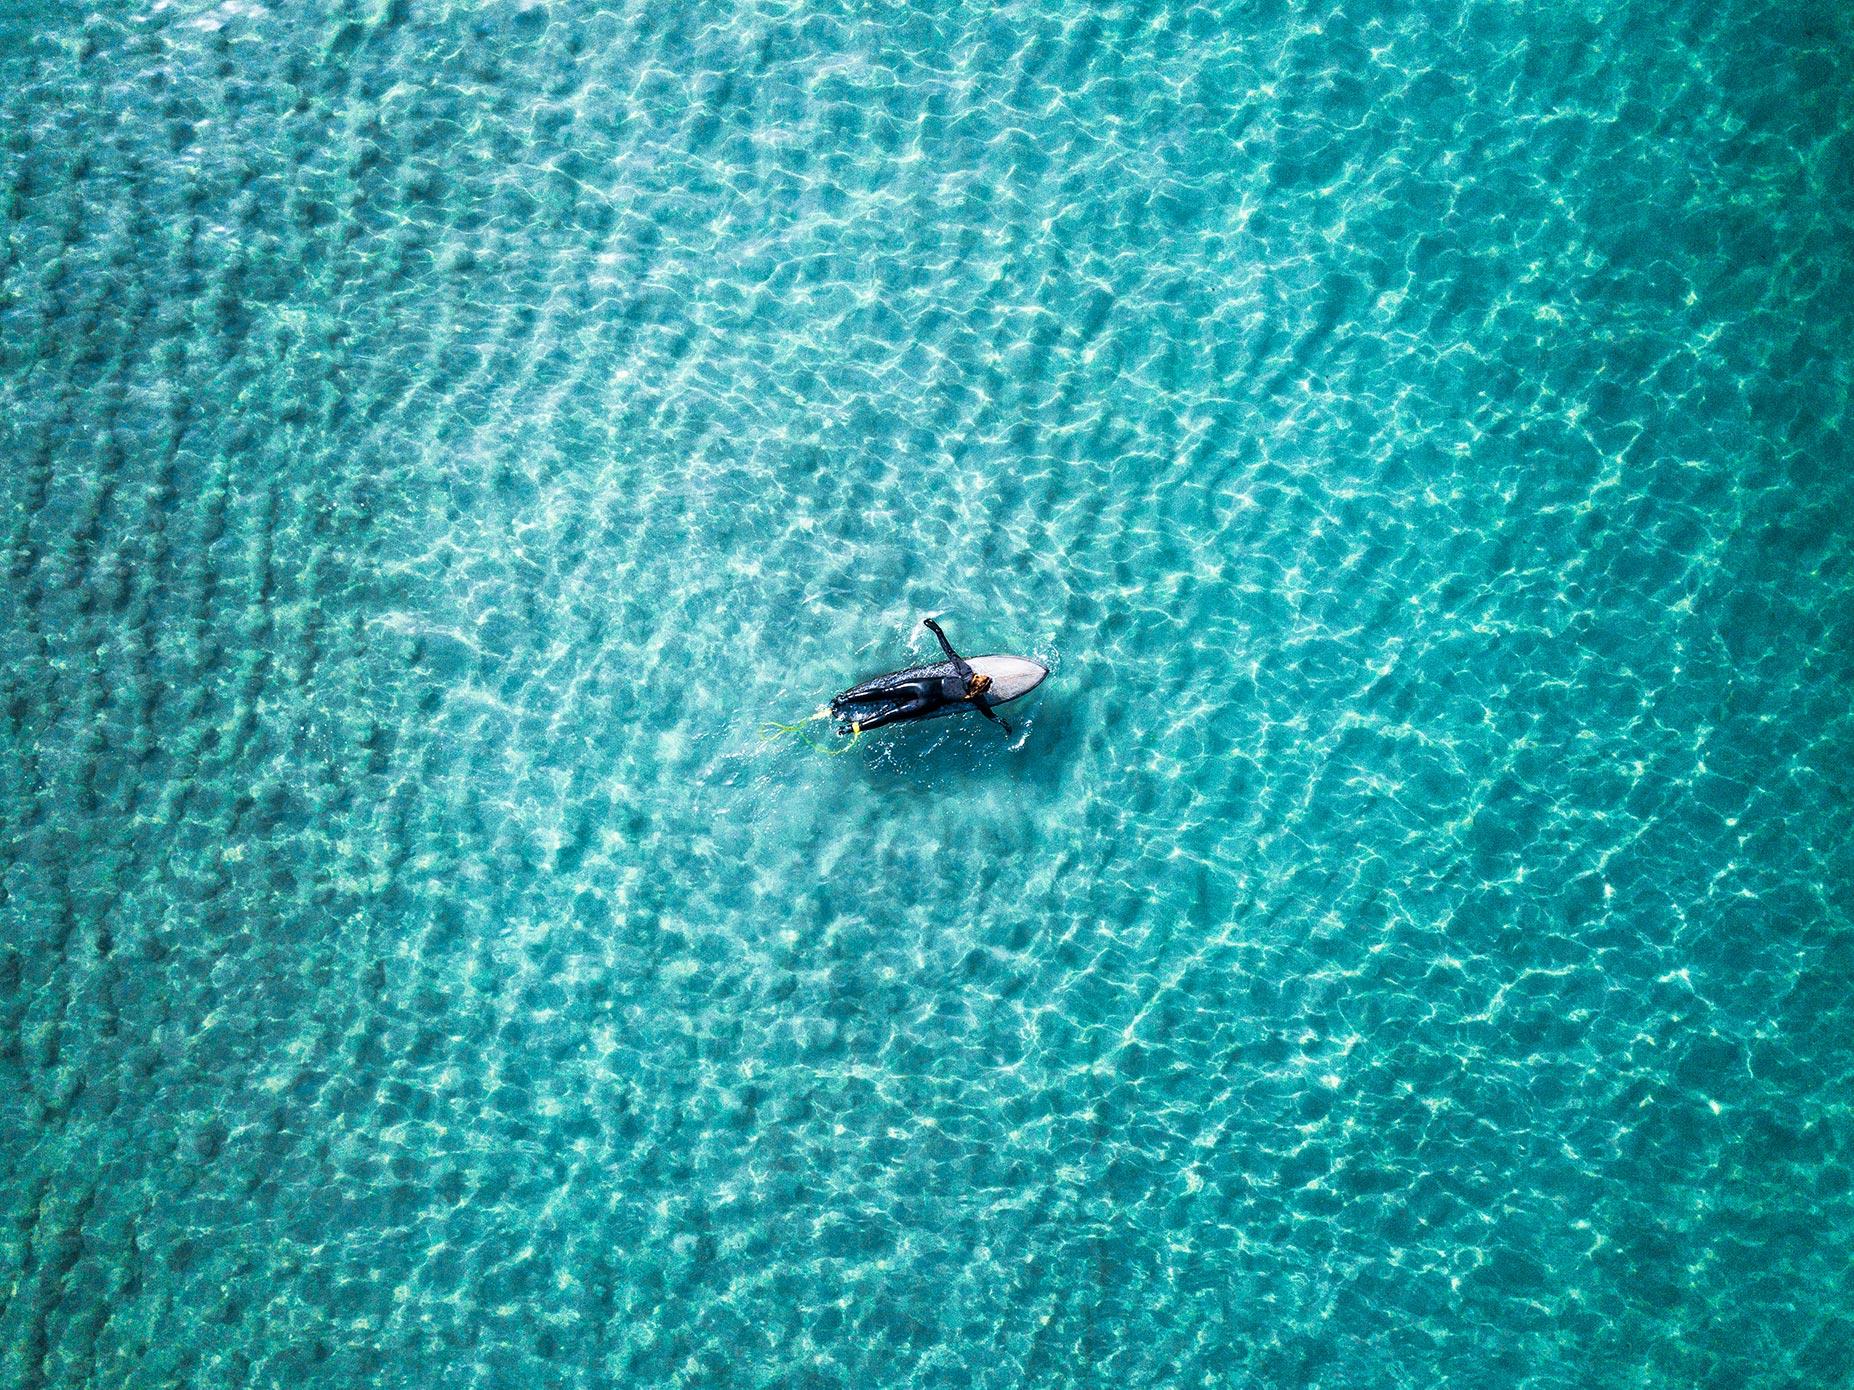 Sixfootfour-Studio-Carlos-Rollan-Lofoten-Drone-II-2019-EDIT.jpg